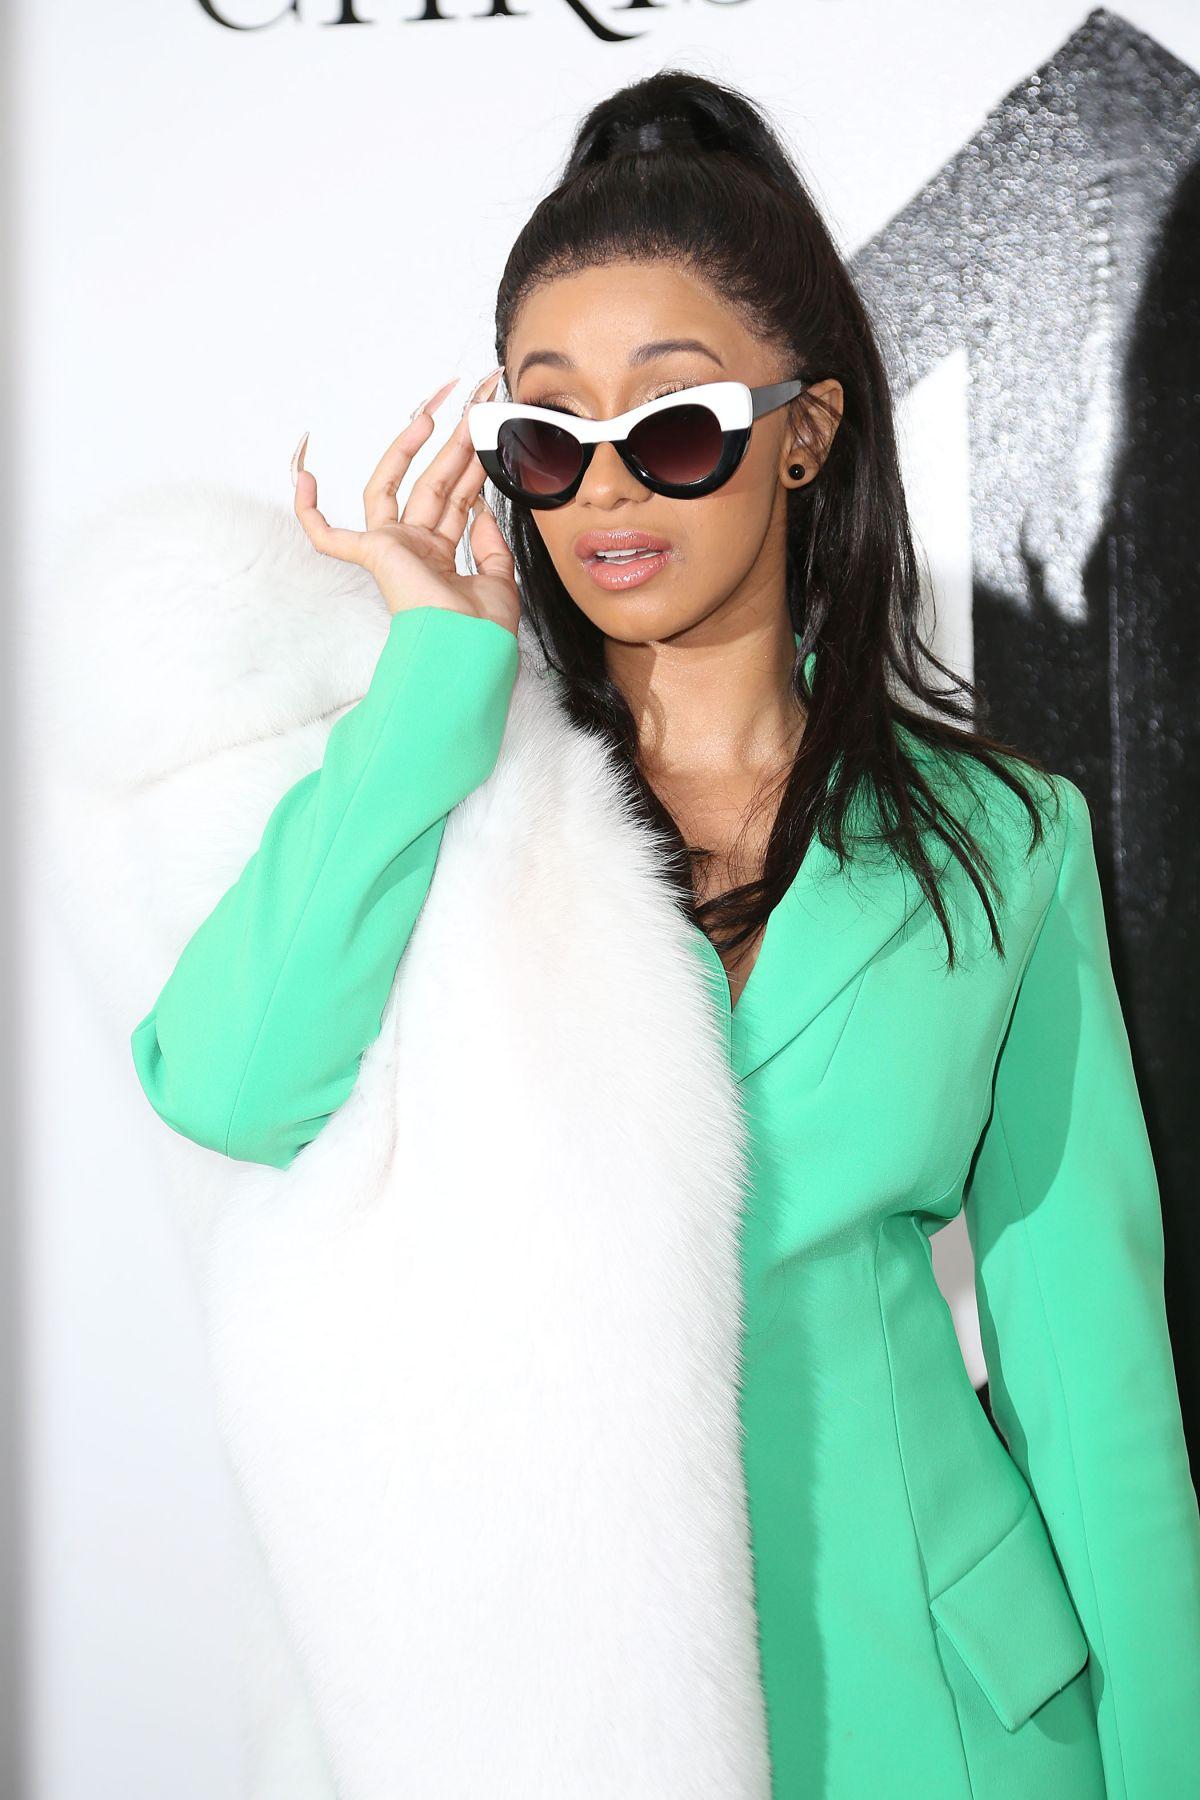 CARDI B at Christian Siriano Fashion Show at NYFW in New York 02/10/2018 - HawtCelebs